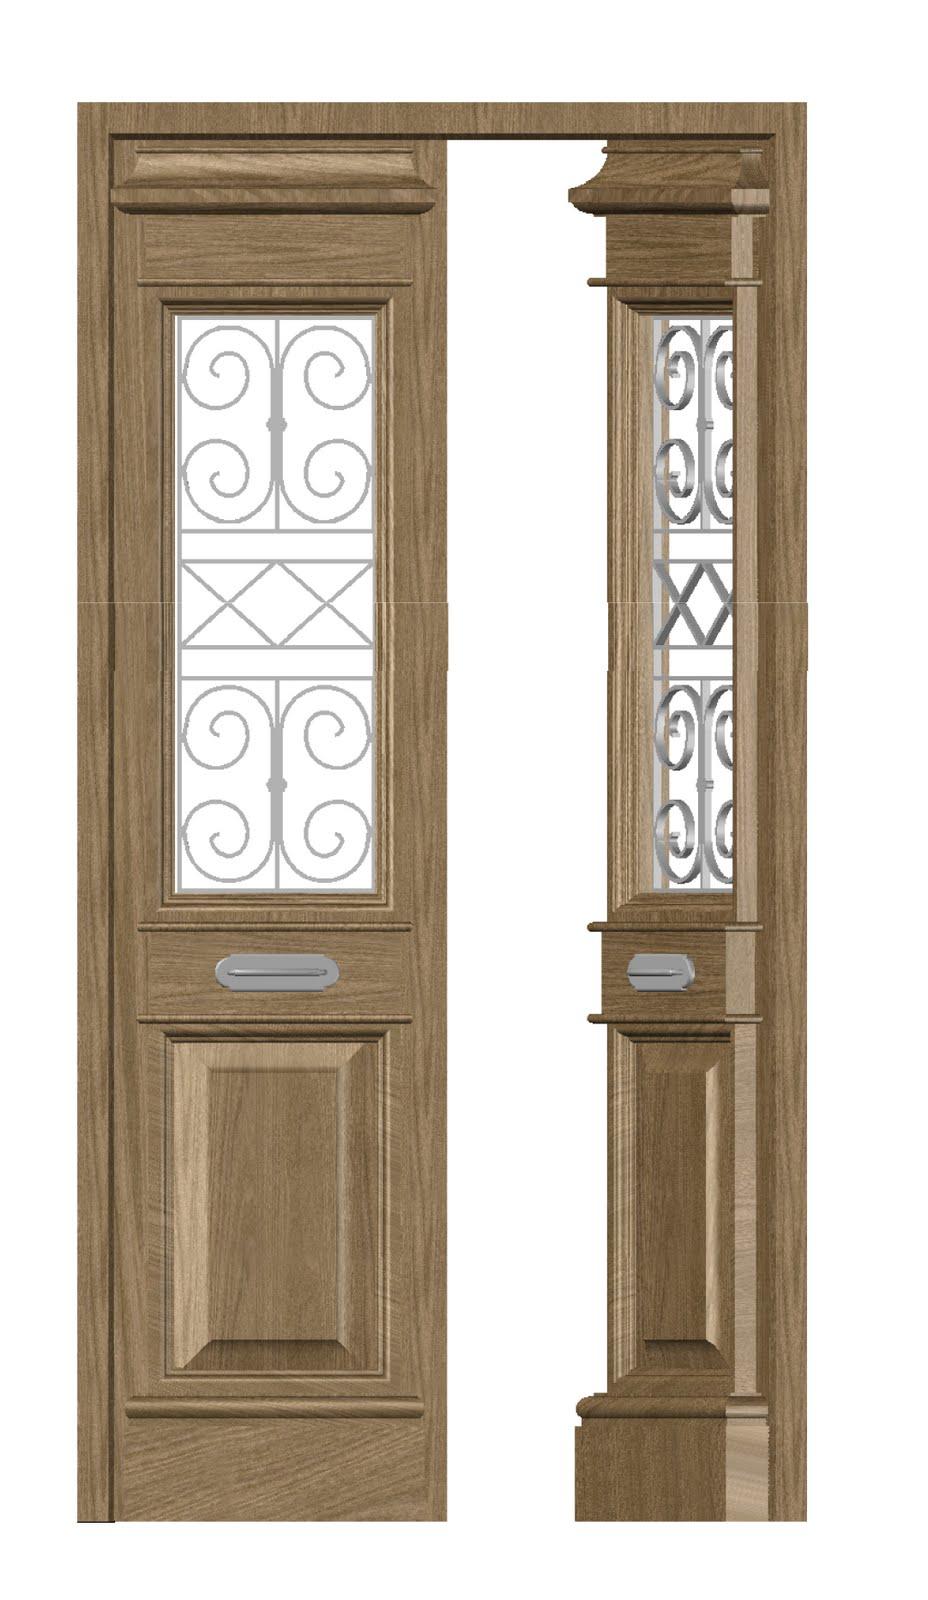 Dise os en madera puerta exterior de forja for Disenos puertas de madera exterior